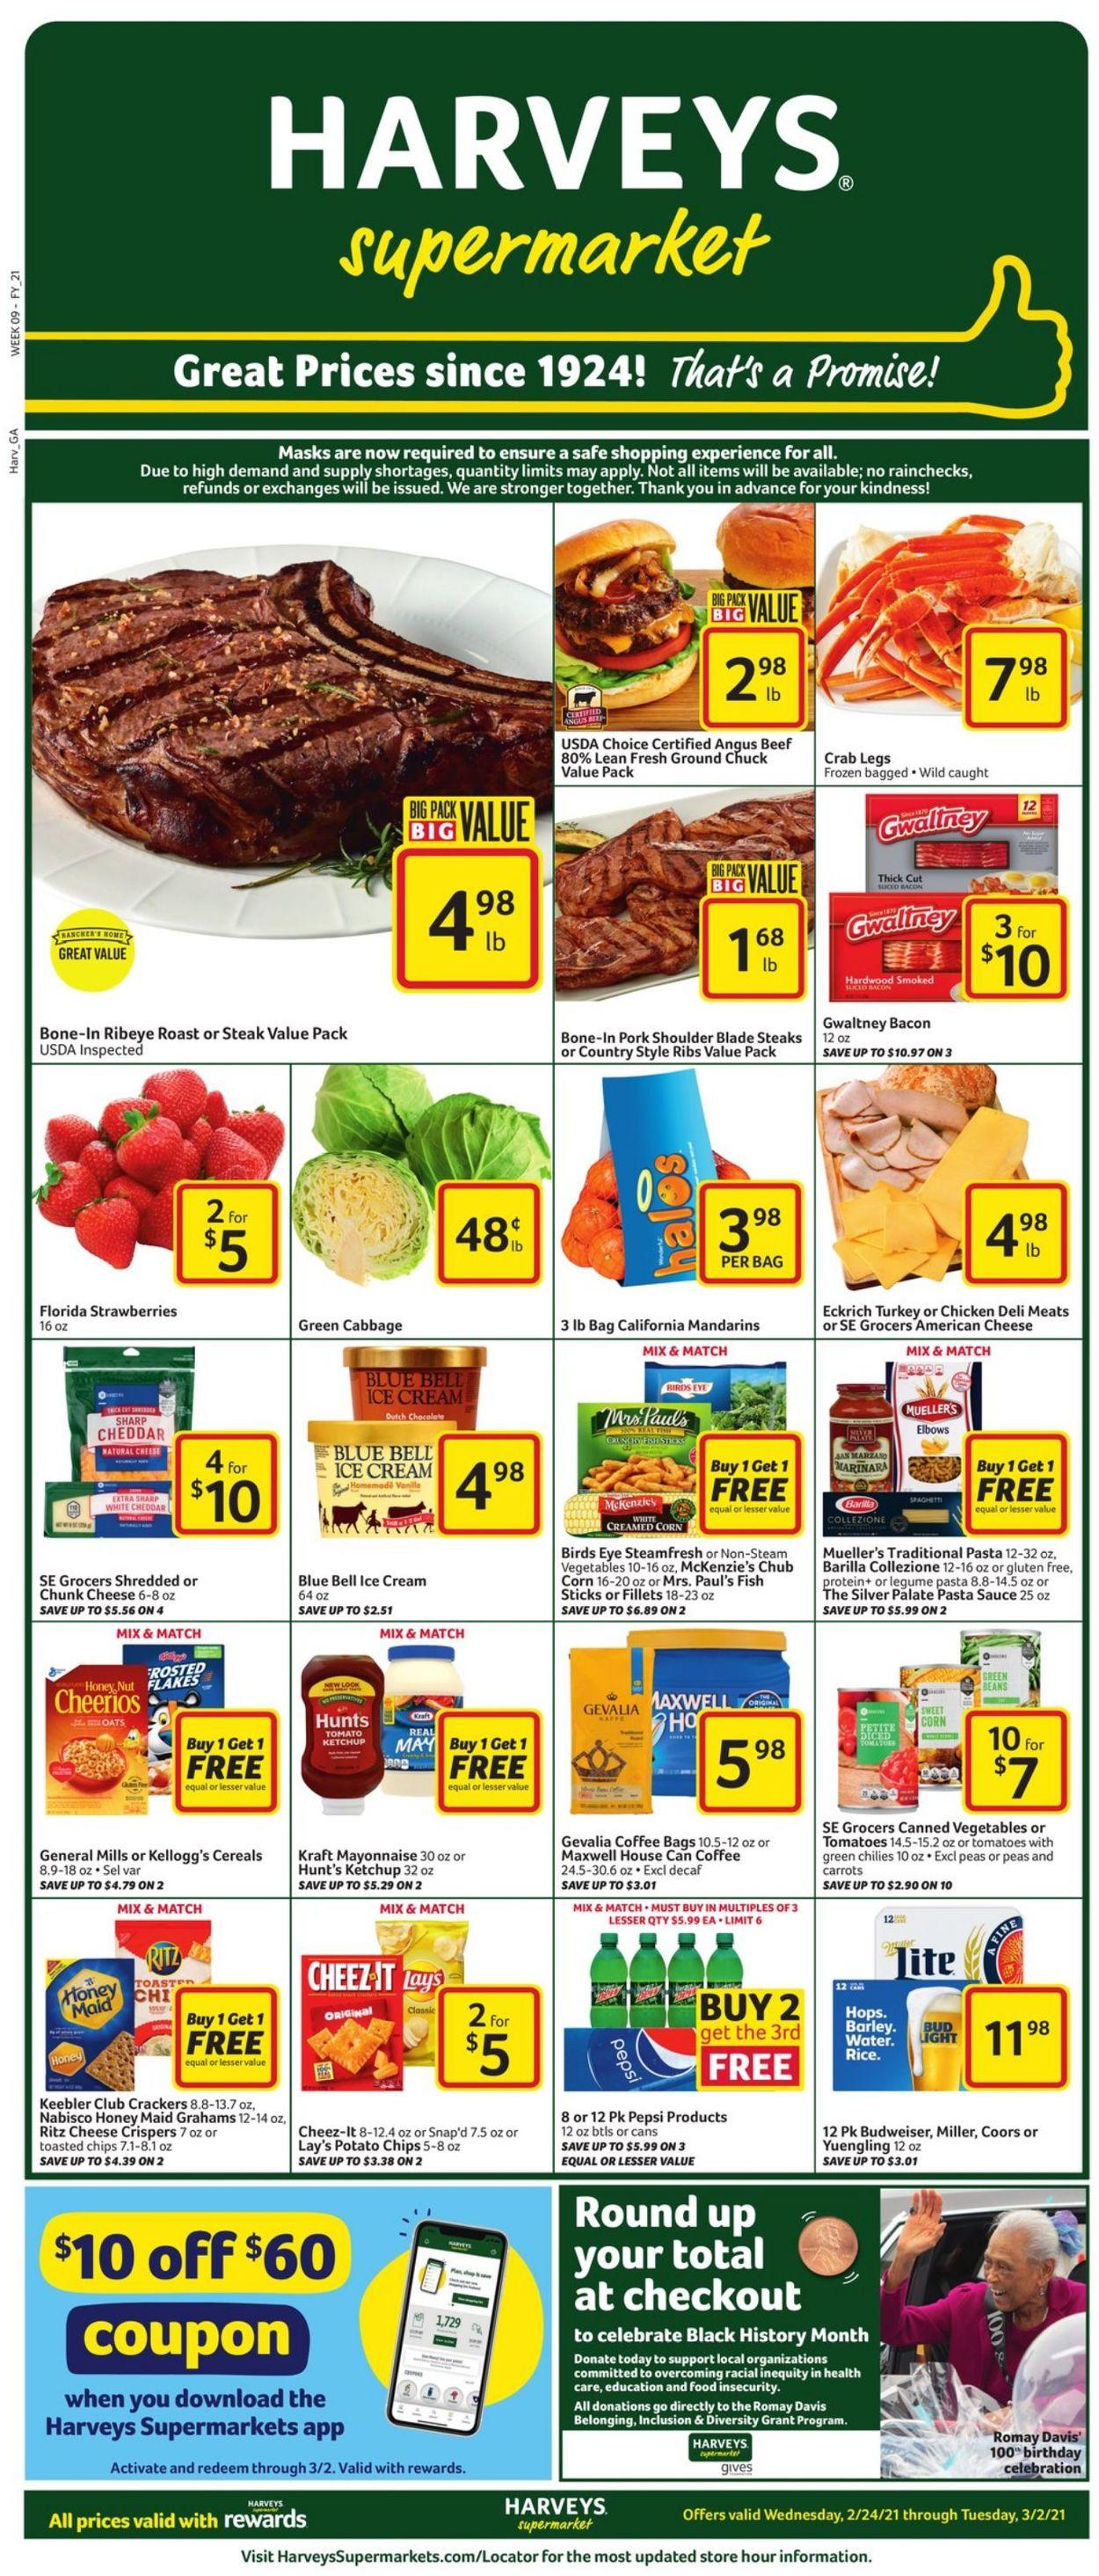 Harveys Supermarket Weekly Ad Circular - valid 02/24-03/02/2021